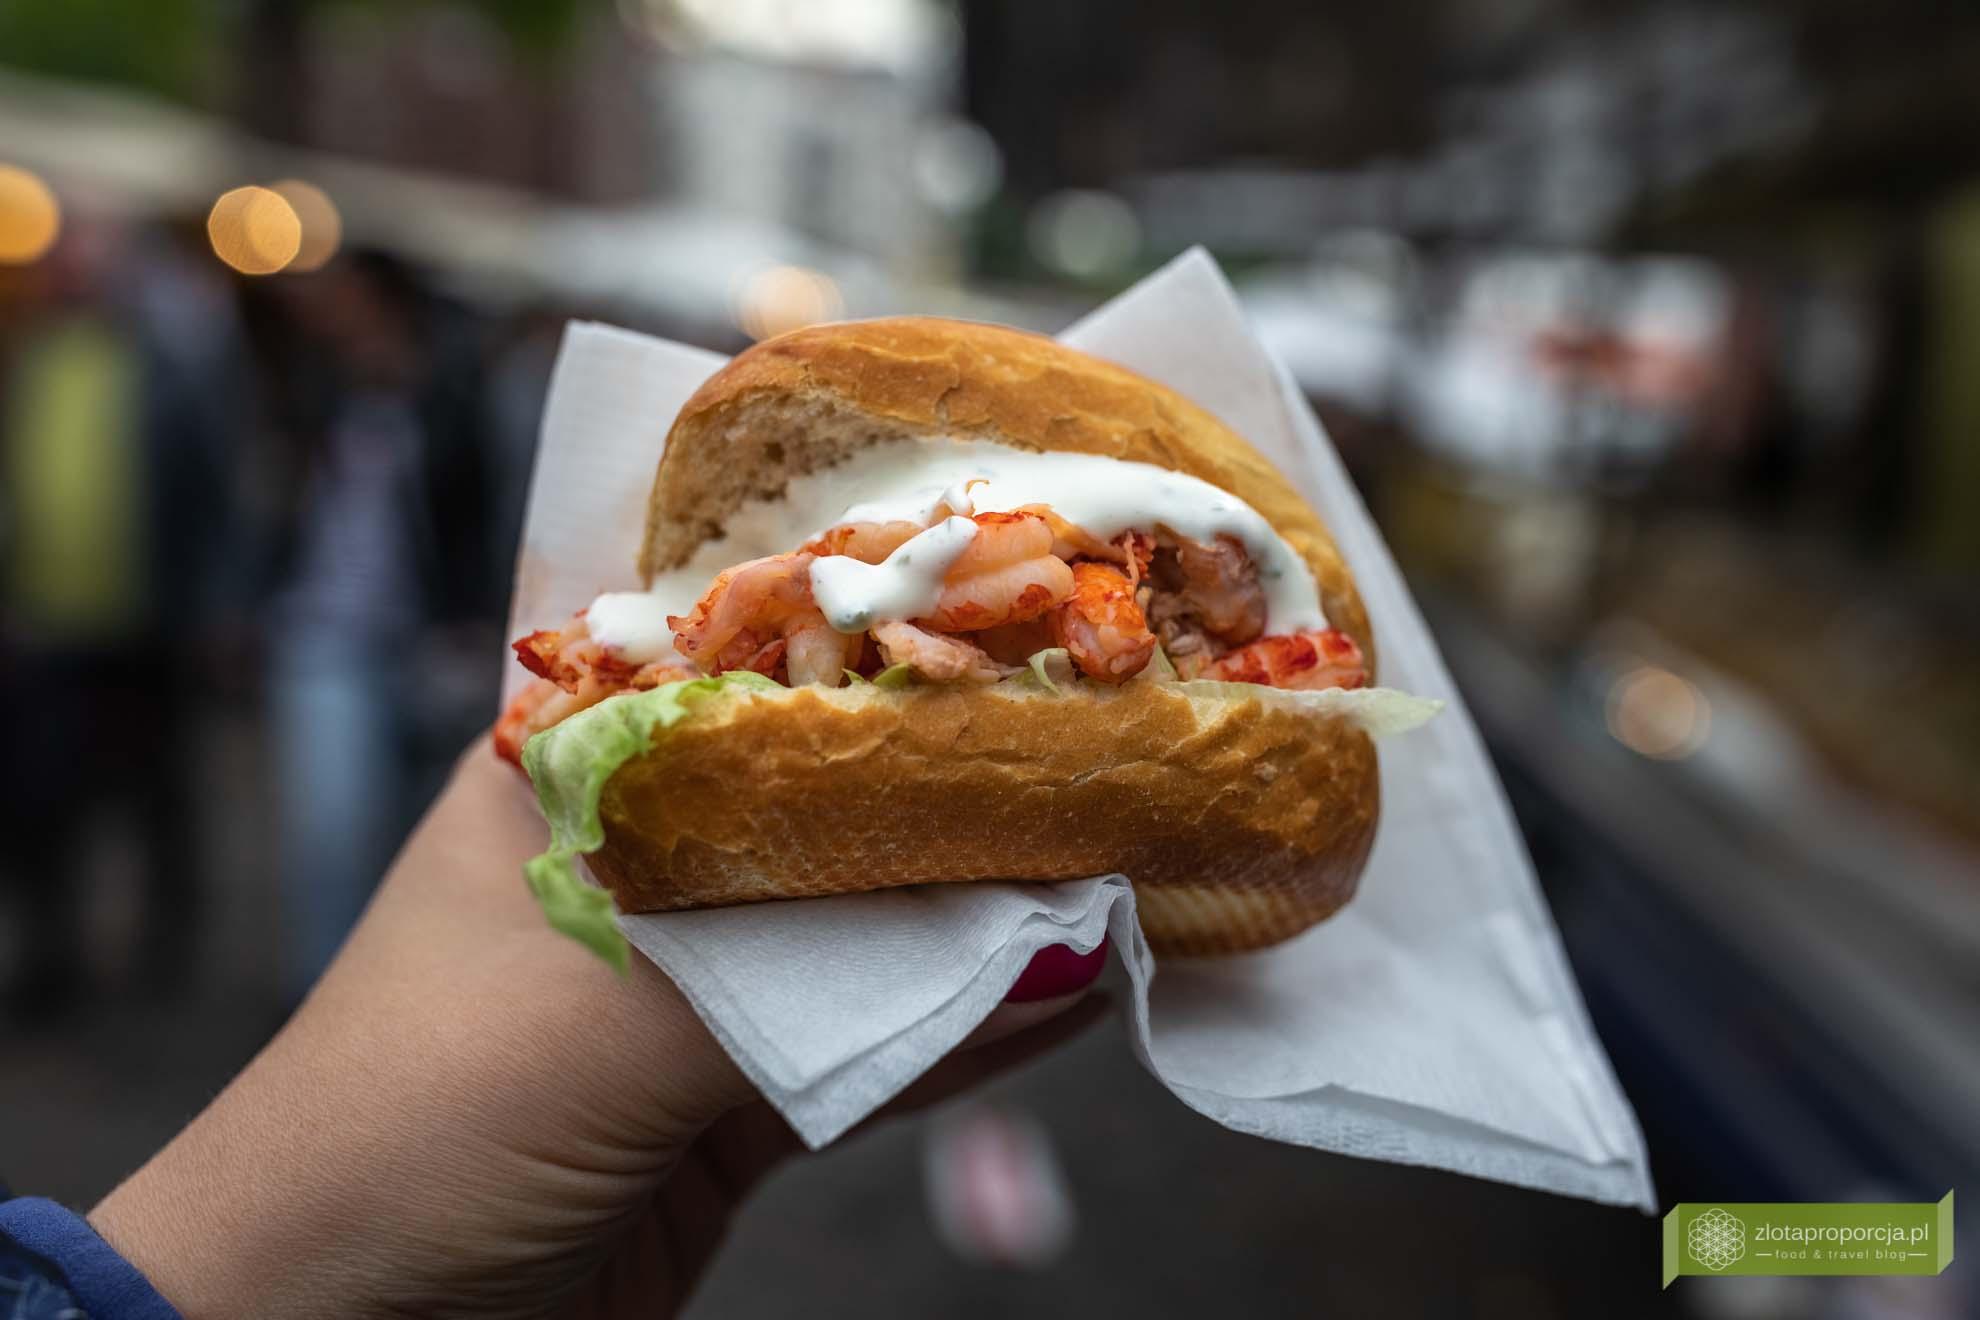 Hamburg, atrakcje Hamburga, Niemcy; Fischmarkt; targ rybny w Hamburgu; Fischmarkt w Hamburgu; kuchnia Hamburga, co zjeść w Hamburgu; Fischbrötchen;